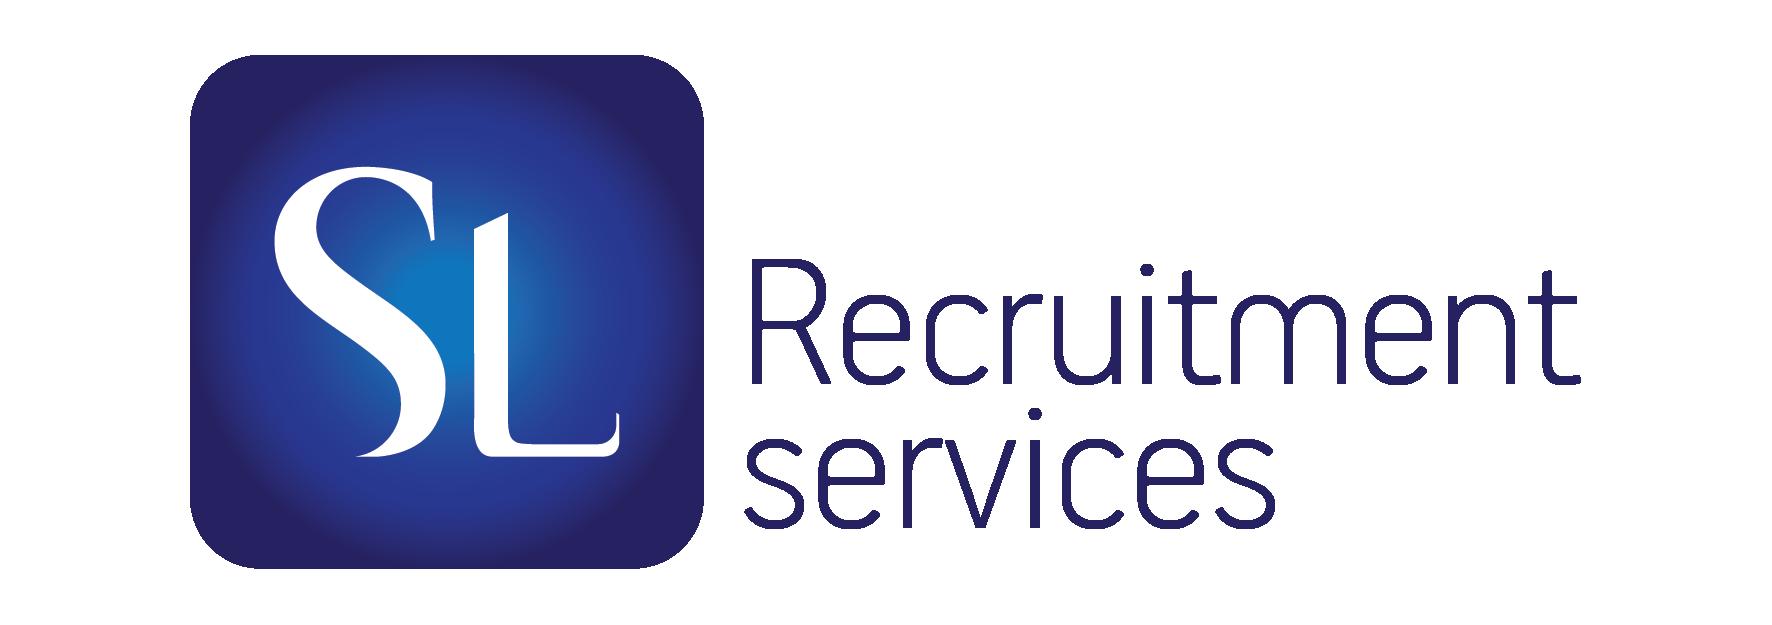 SL Recruitment Services